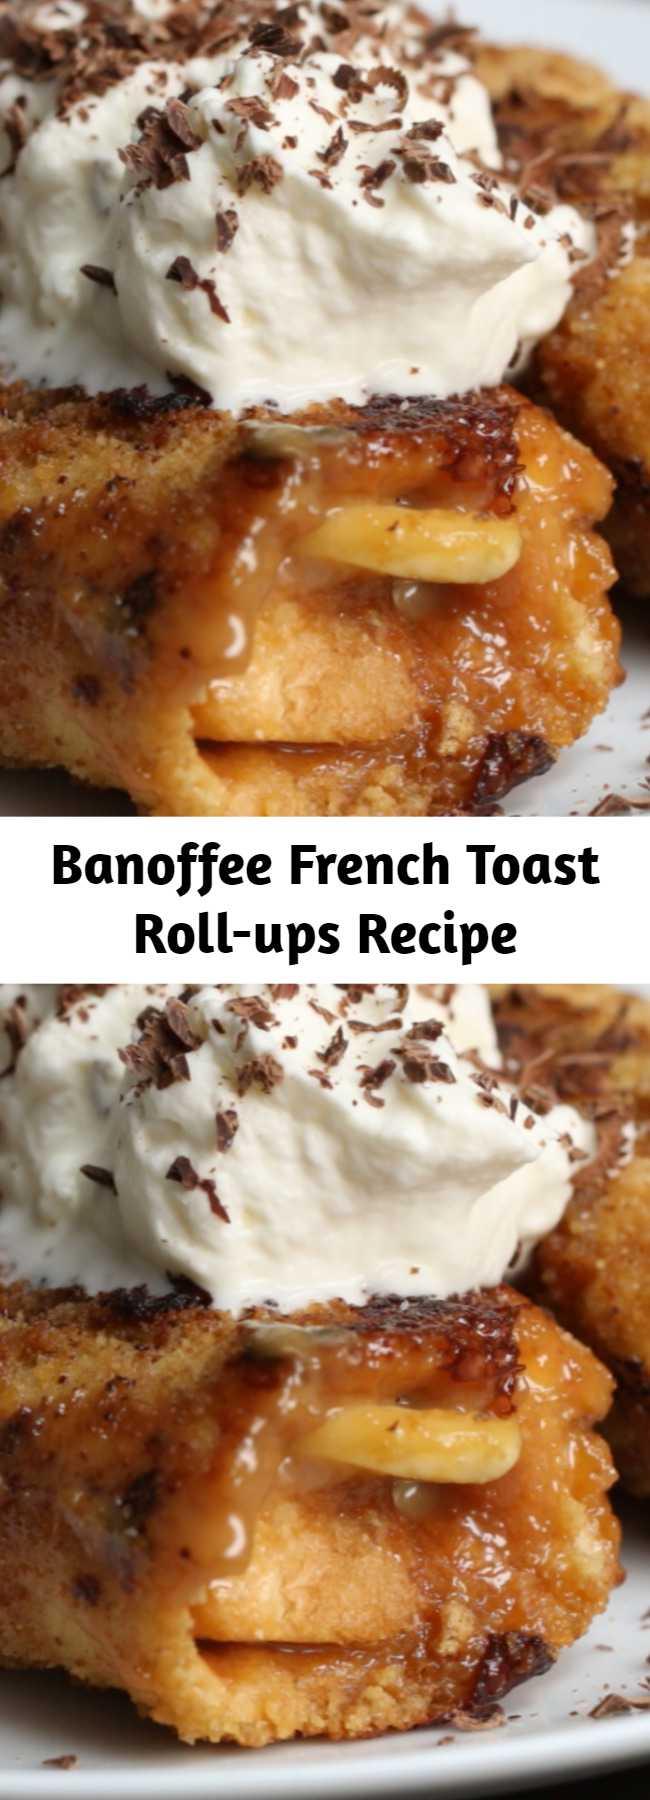 Banoffee French Toast Roll-ups Recipe